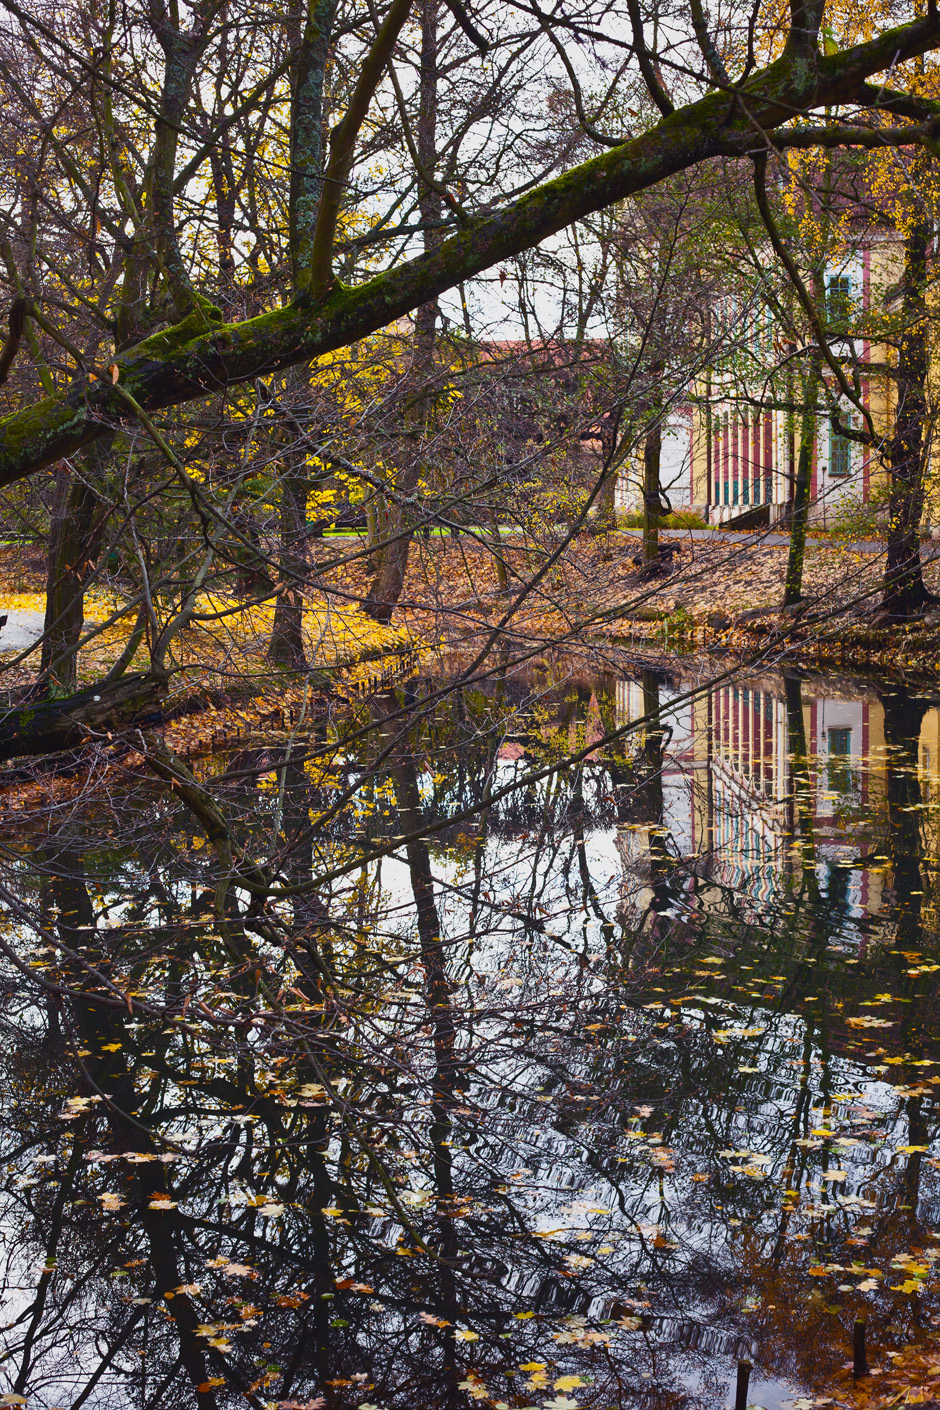 park-oliwski-jesienia-fotografia-blog-innooka-9